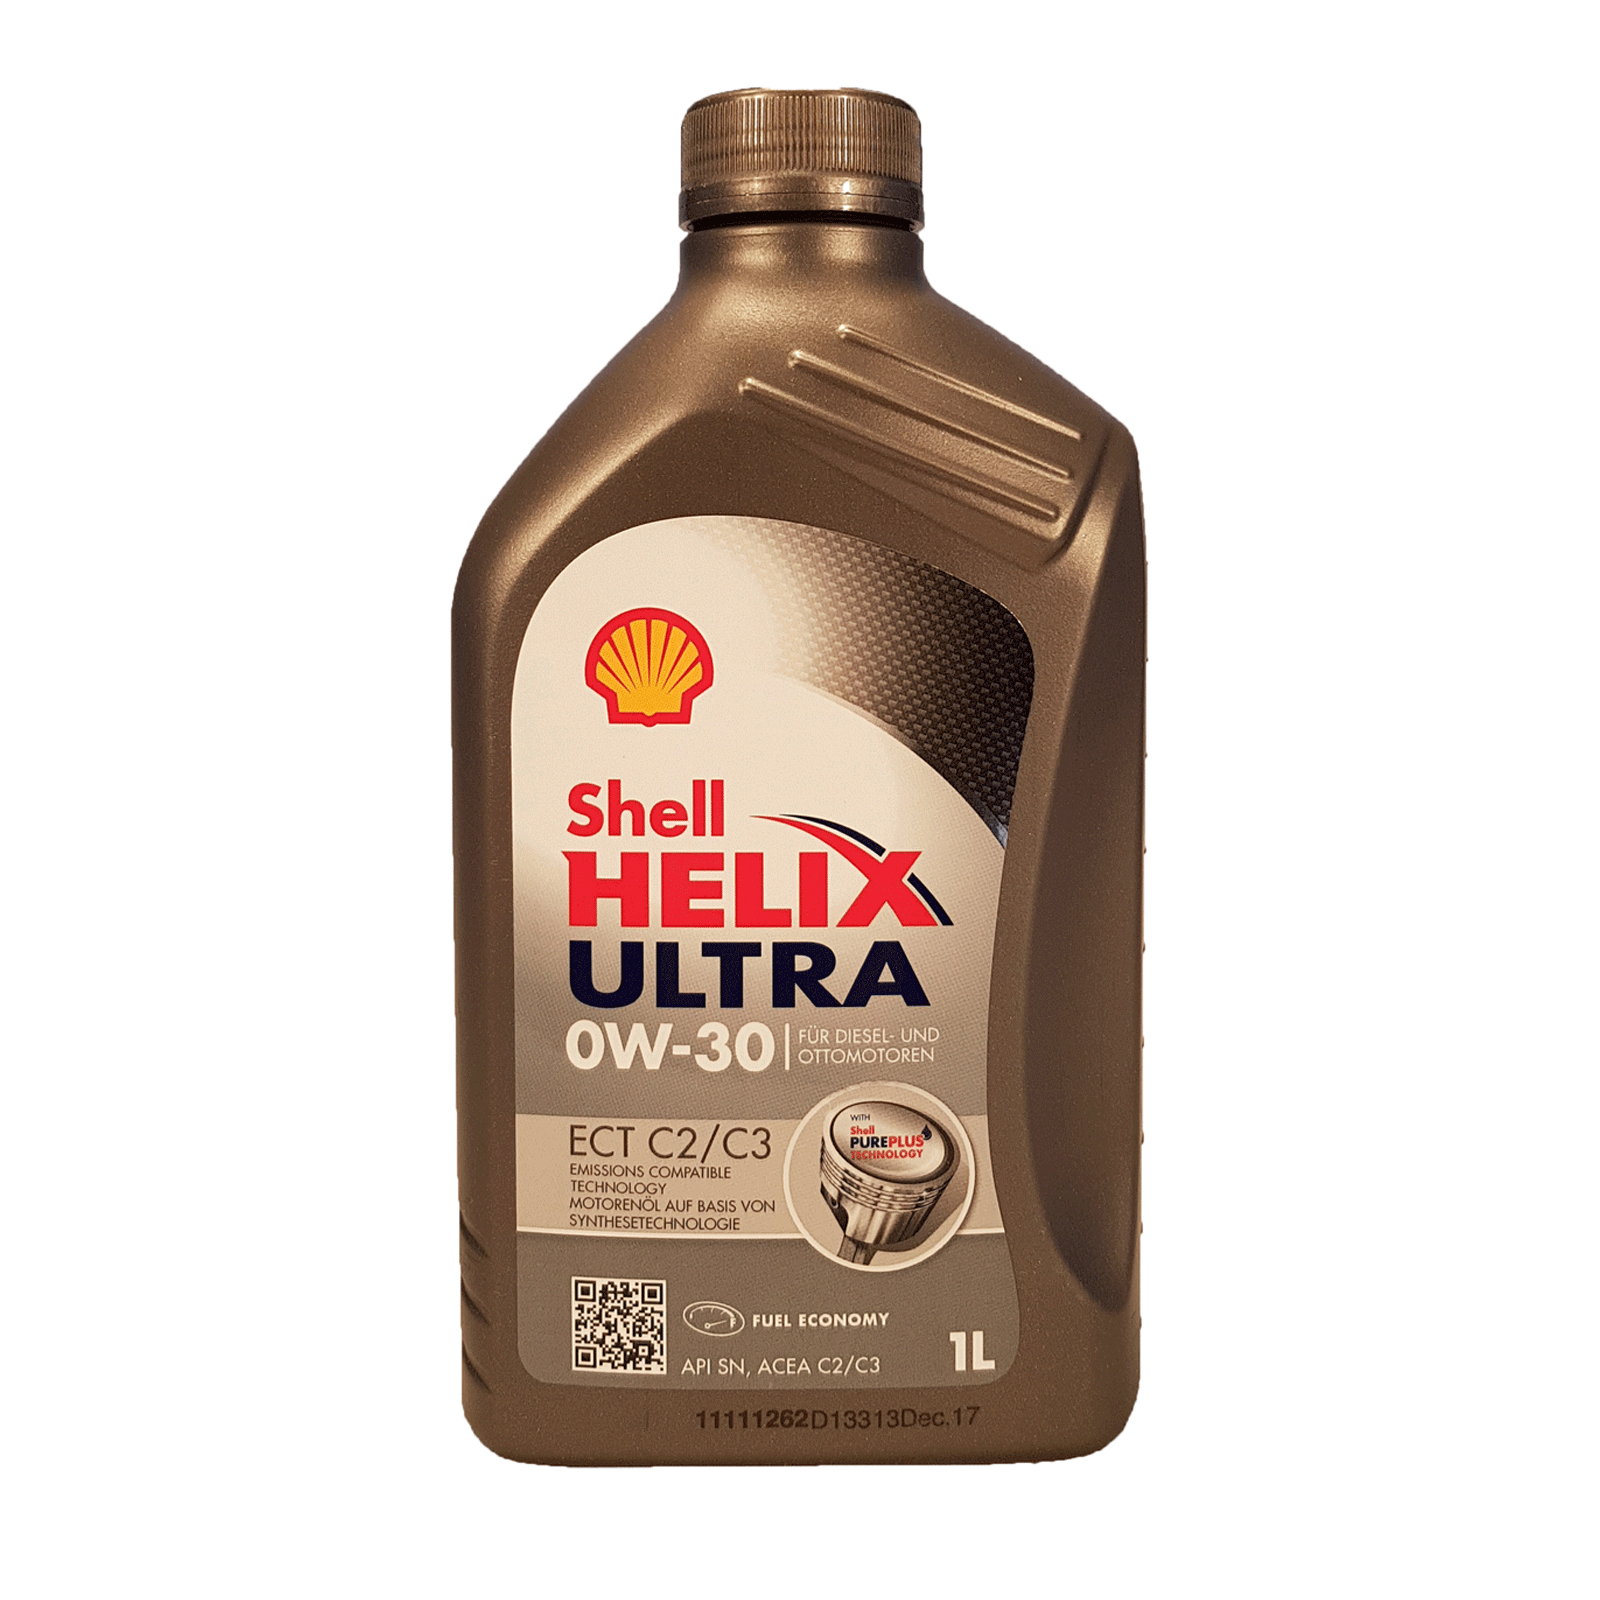 Shell Helix Ultra ECT C2 C3 0W-30 1 Liter – Bild 1